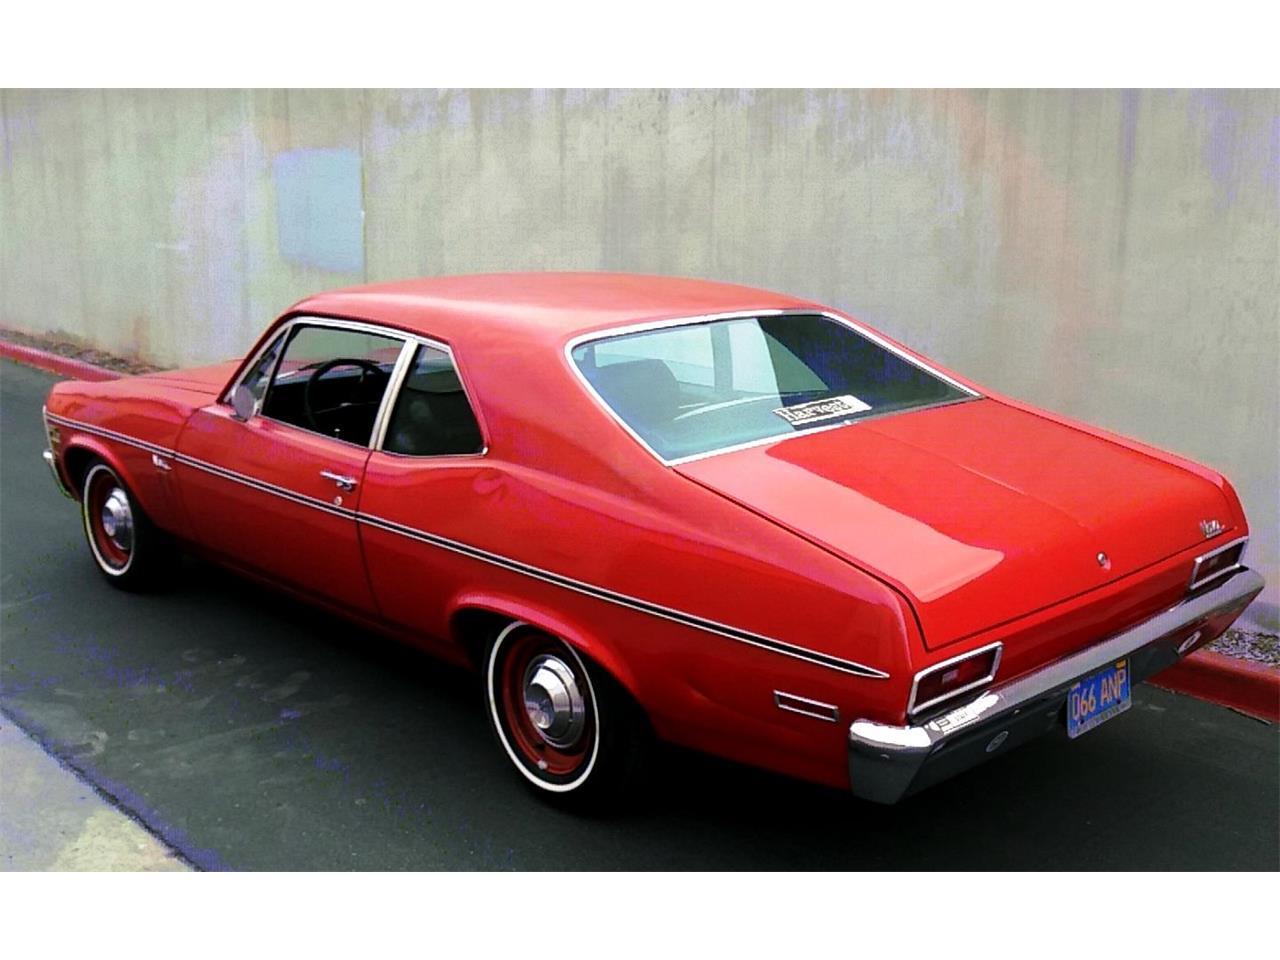 1970 Chevrolet Nova (CC-1248060) for sale in Huntington Beach, California